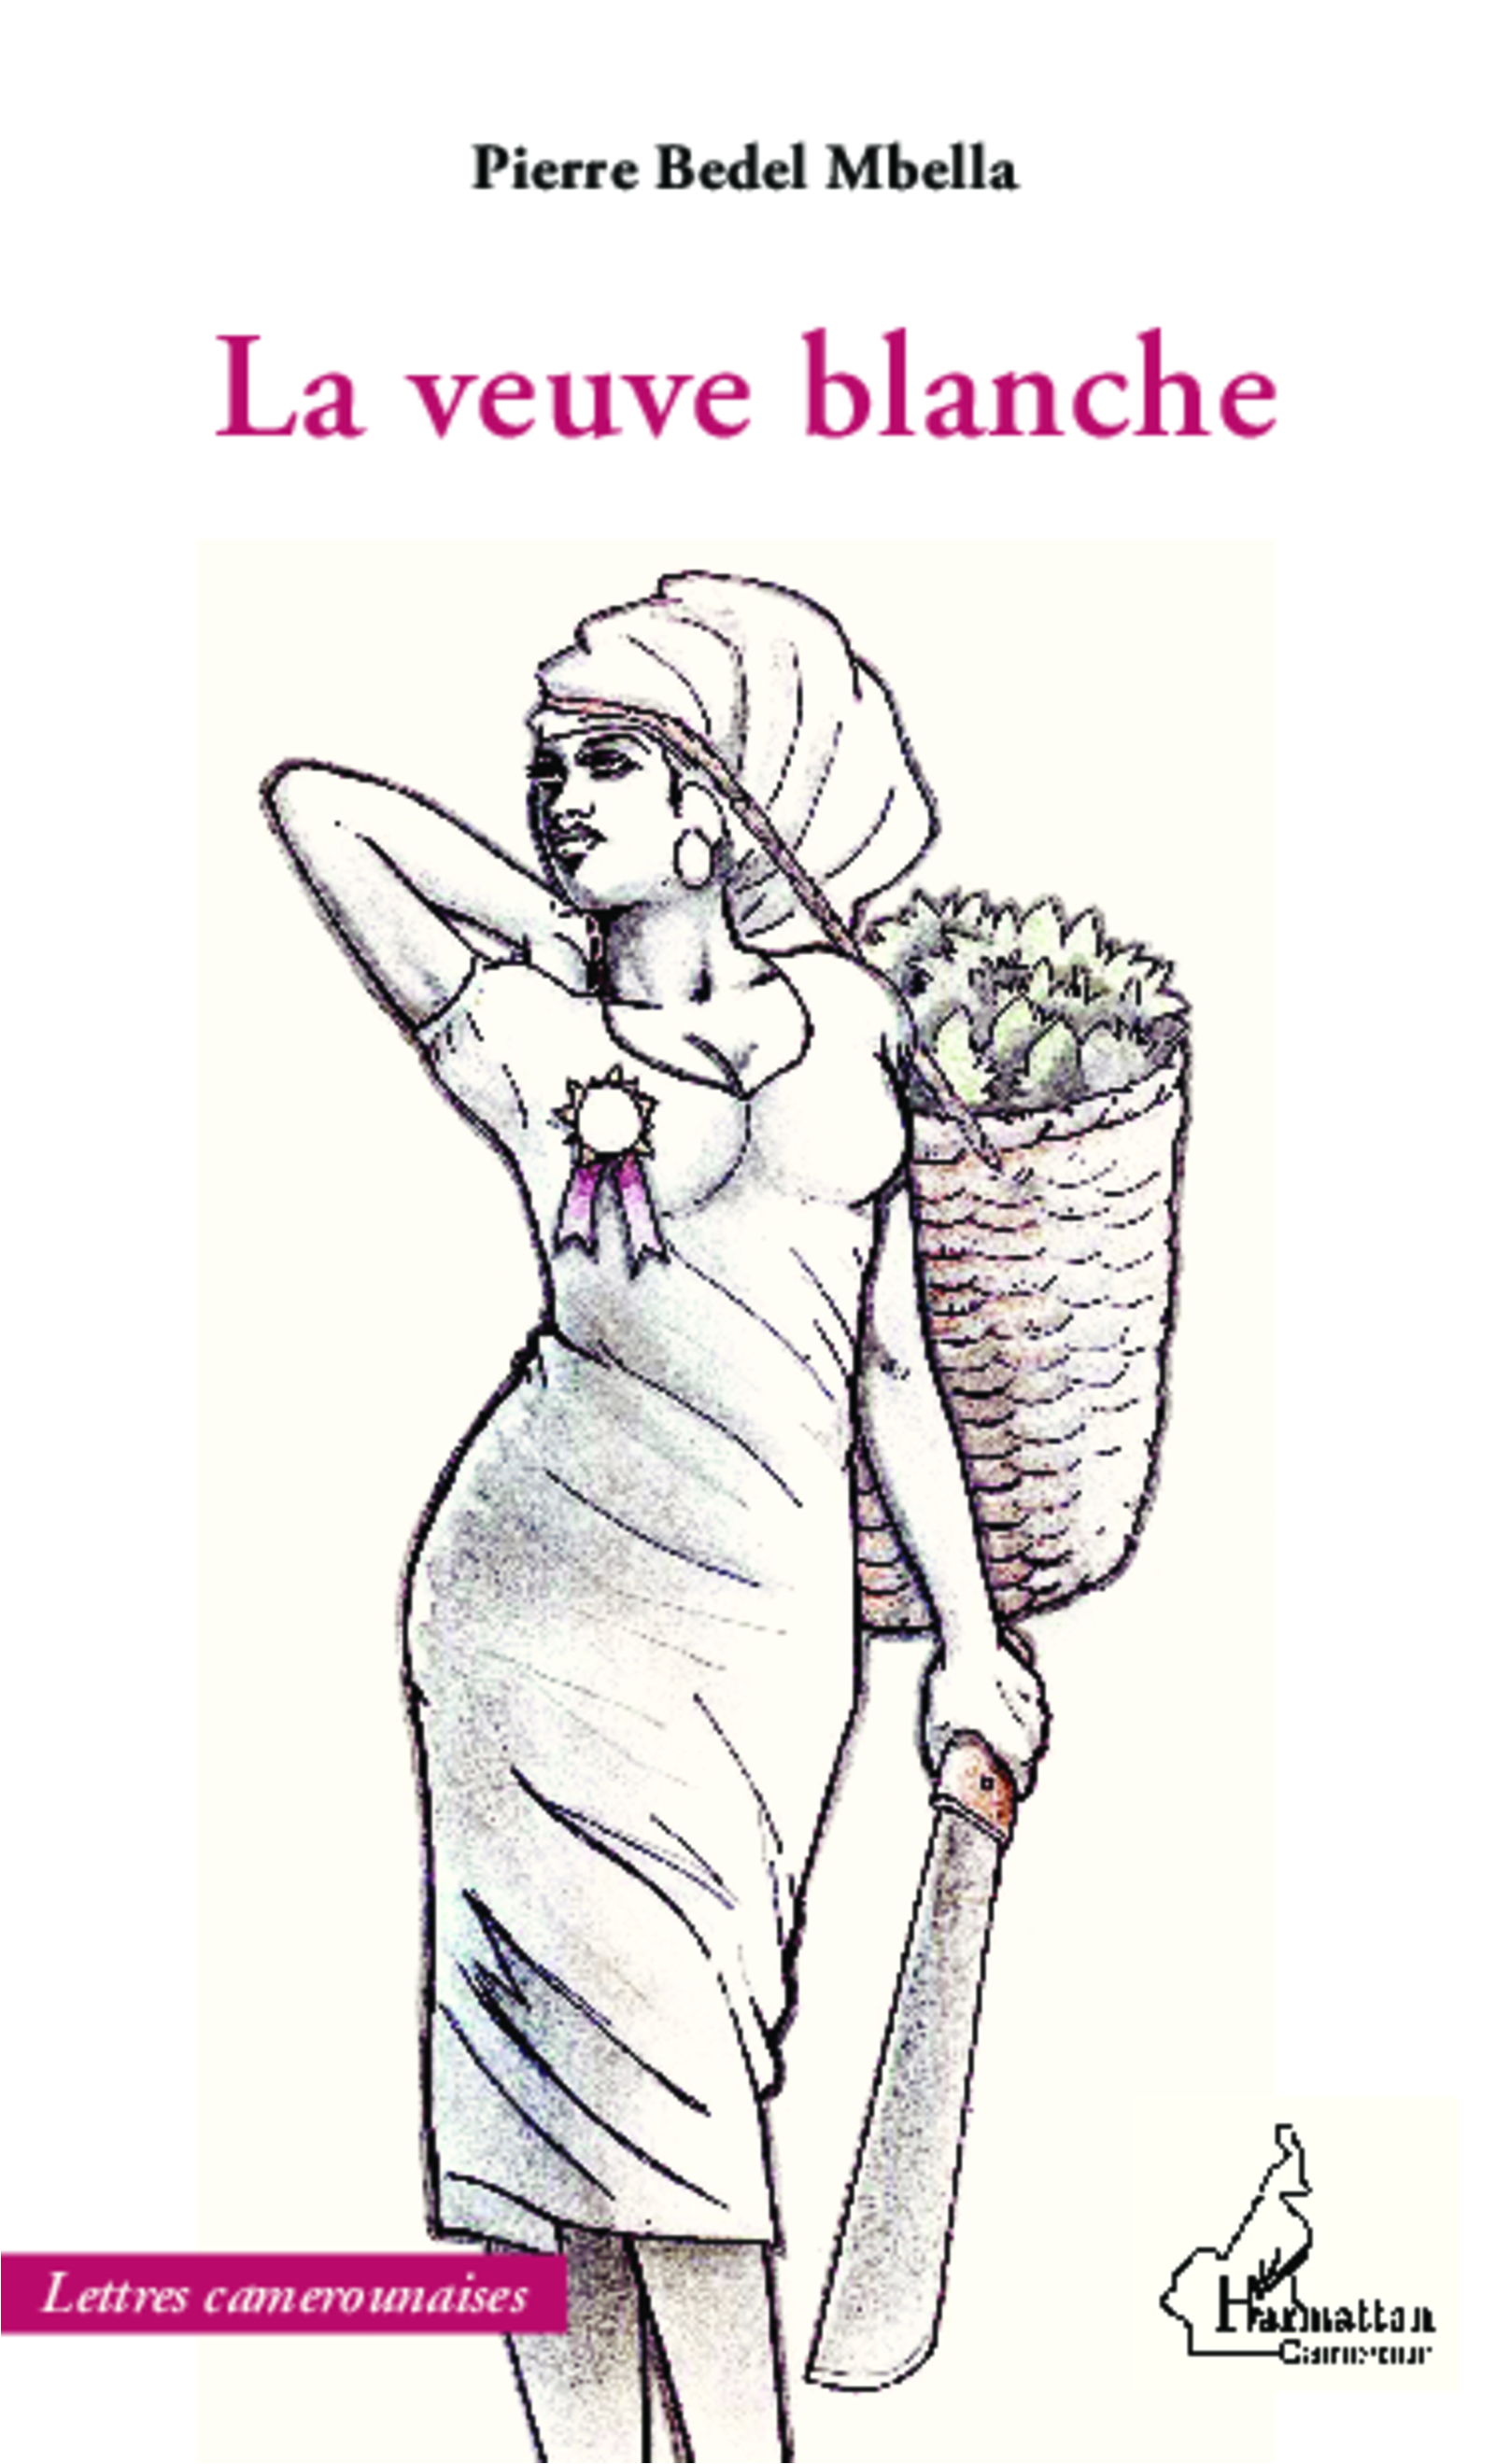 La veuve blanche